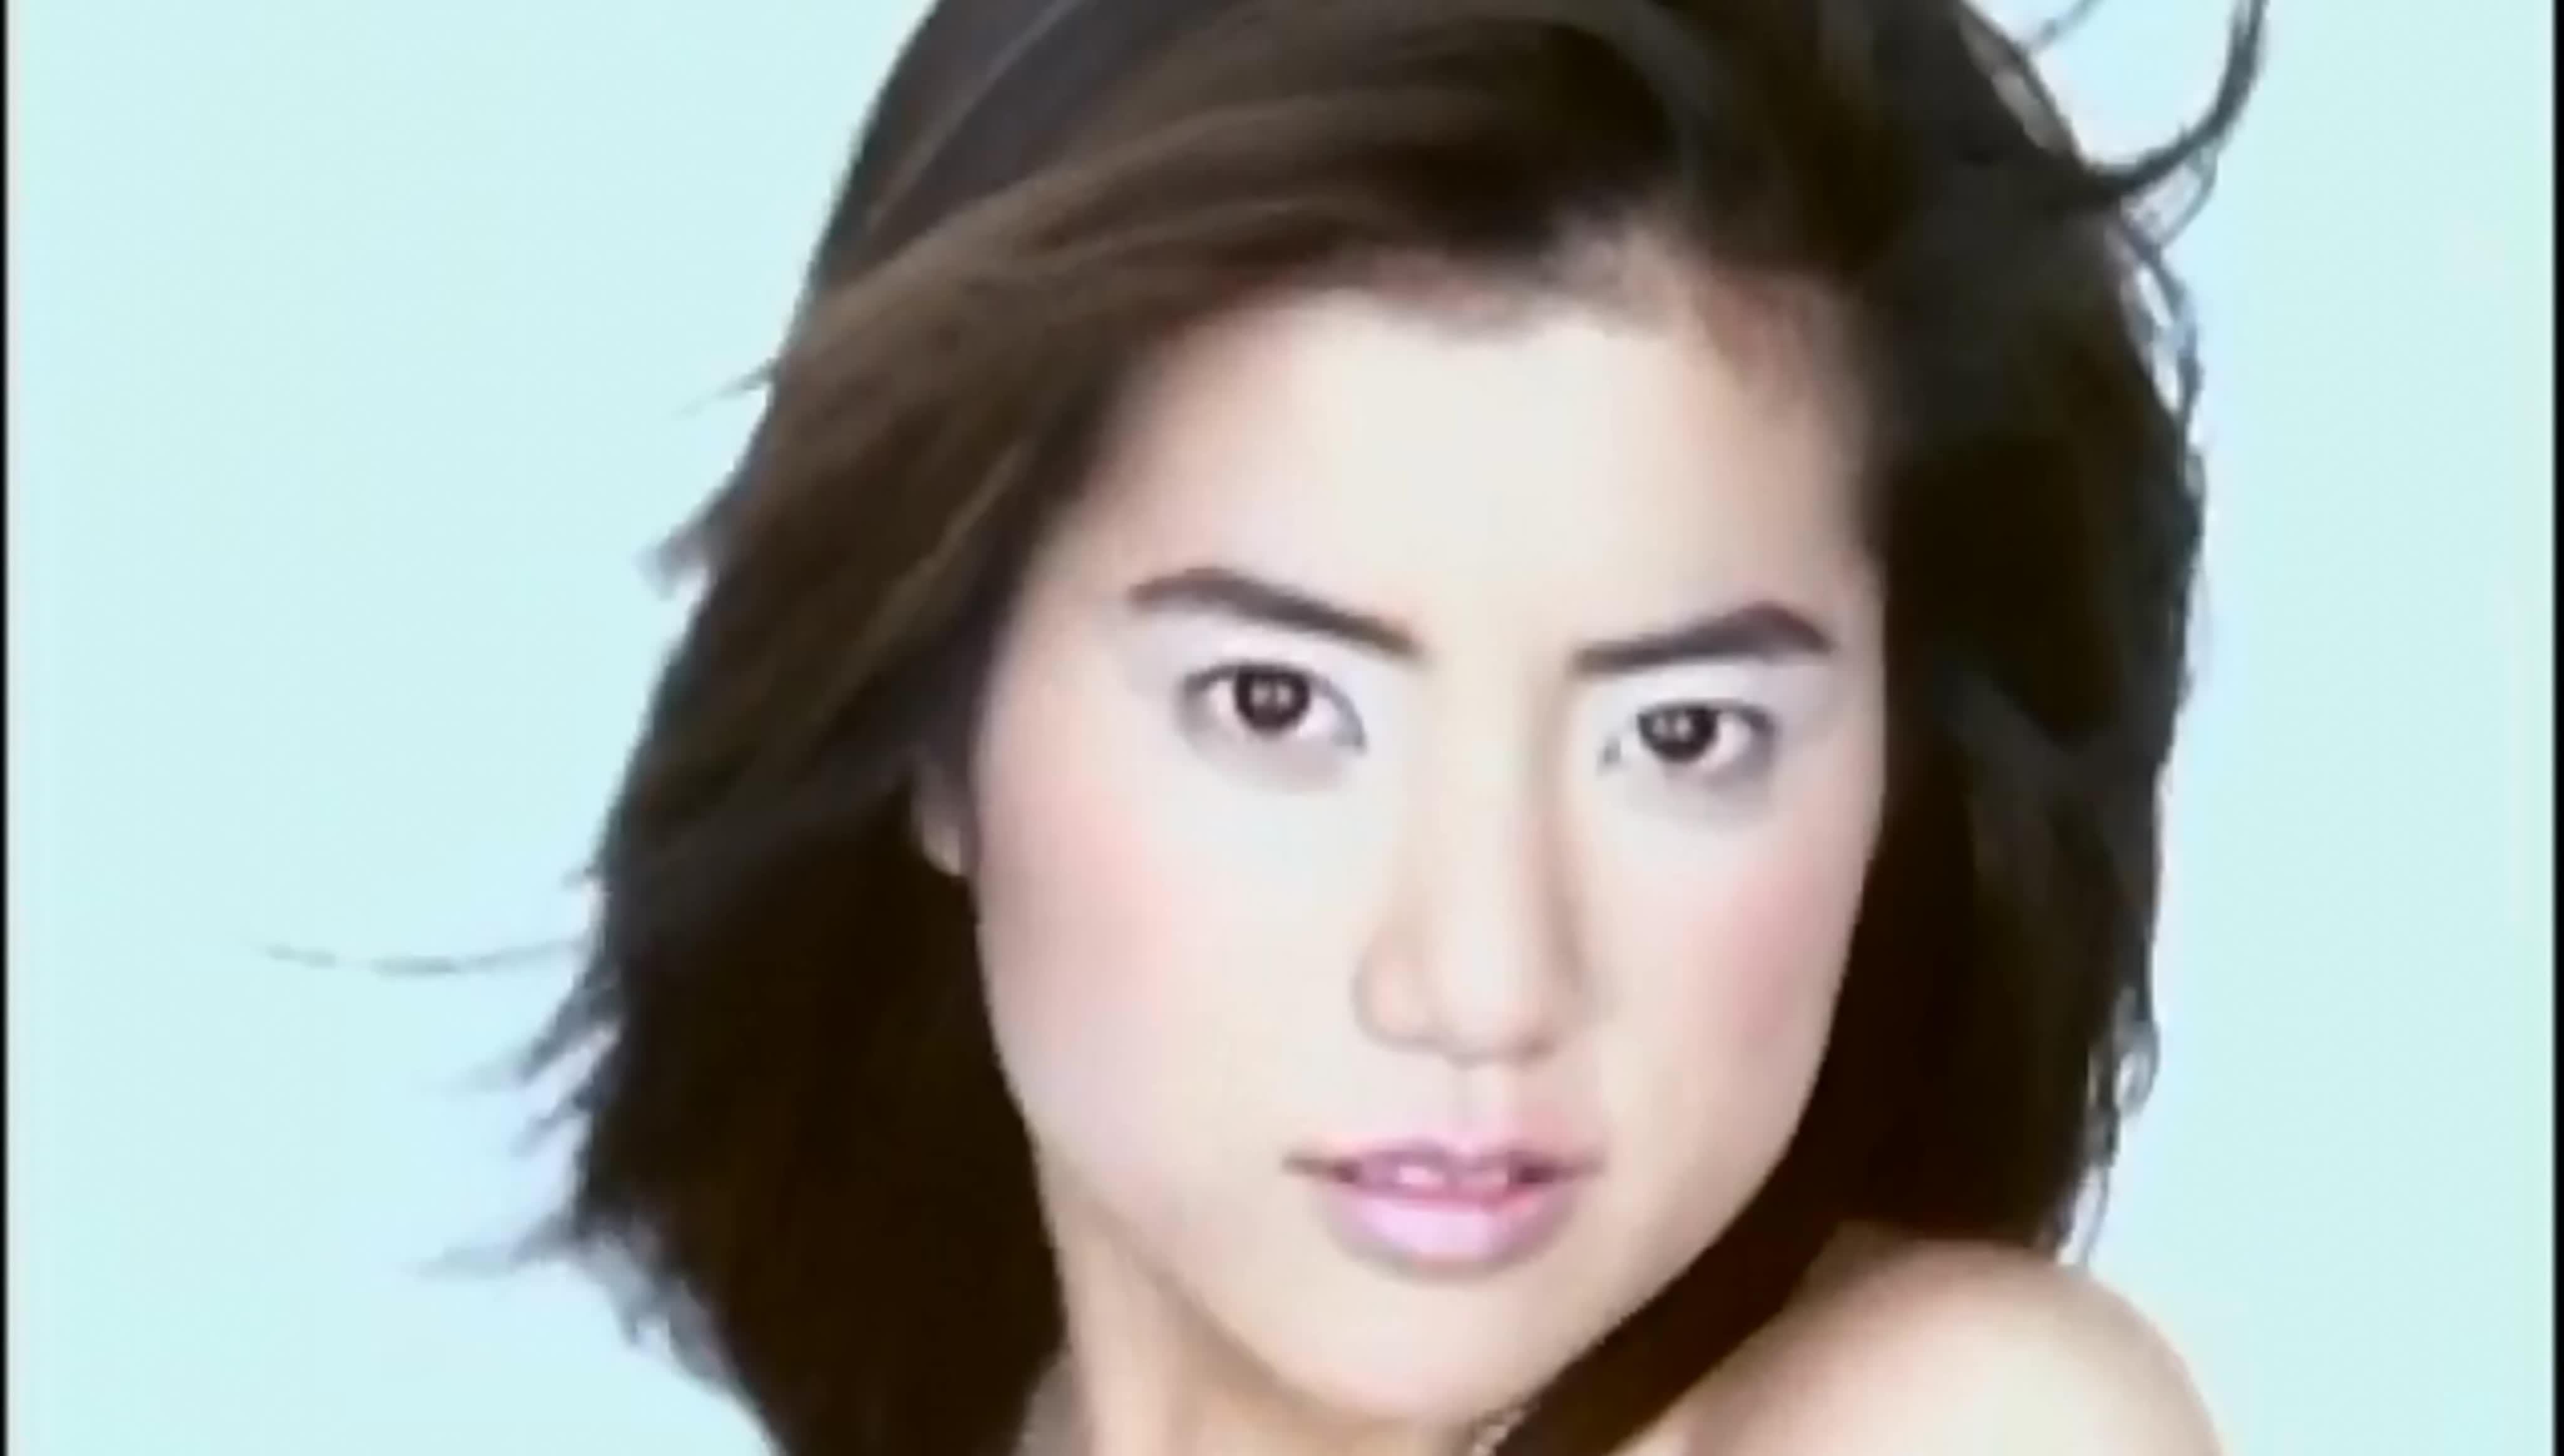 Hitomi candy girl sexy сексуальная японская певица хитоми